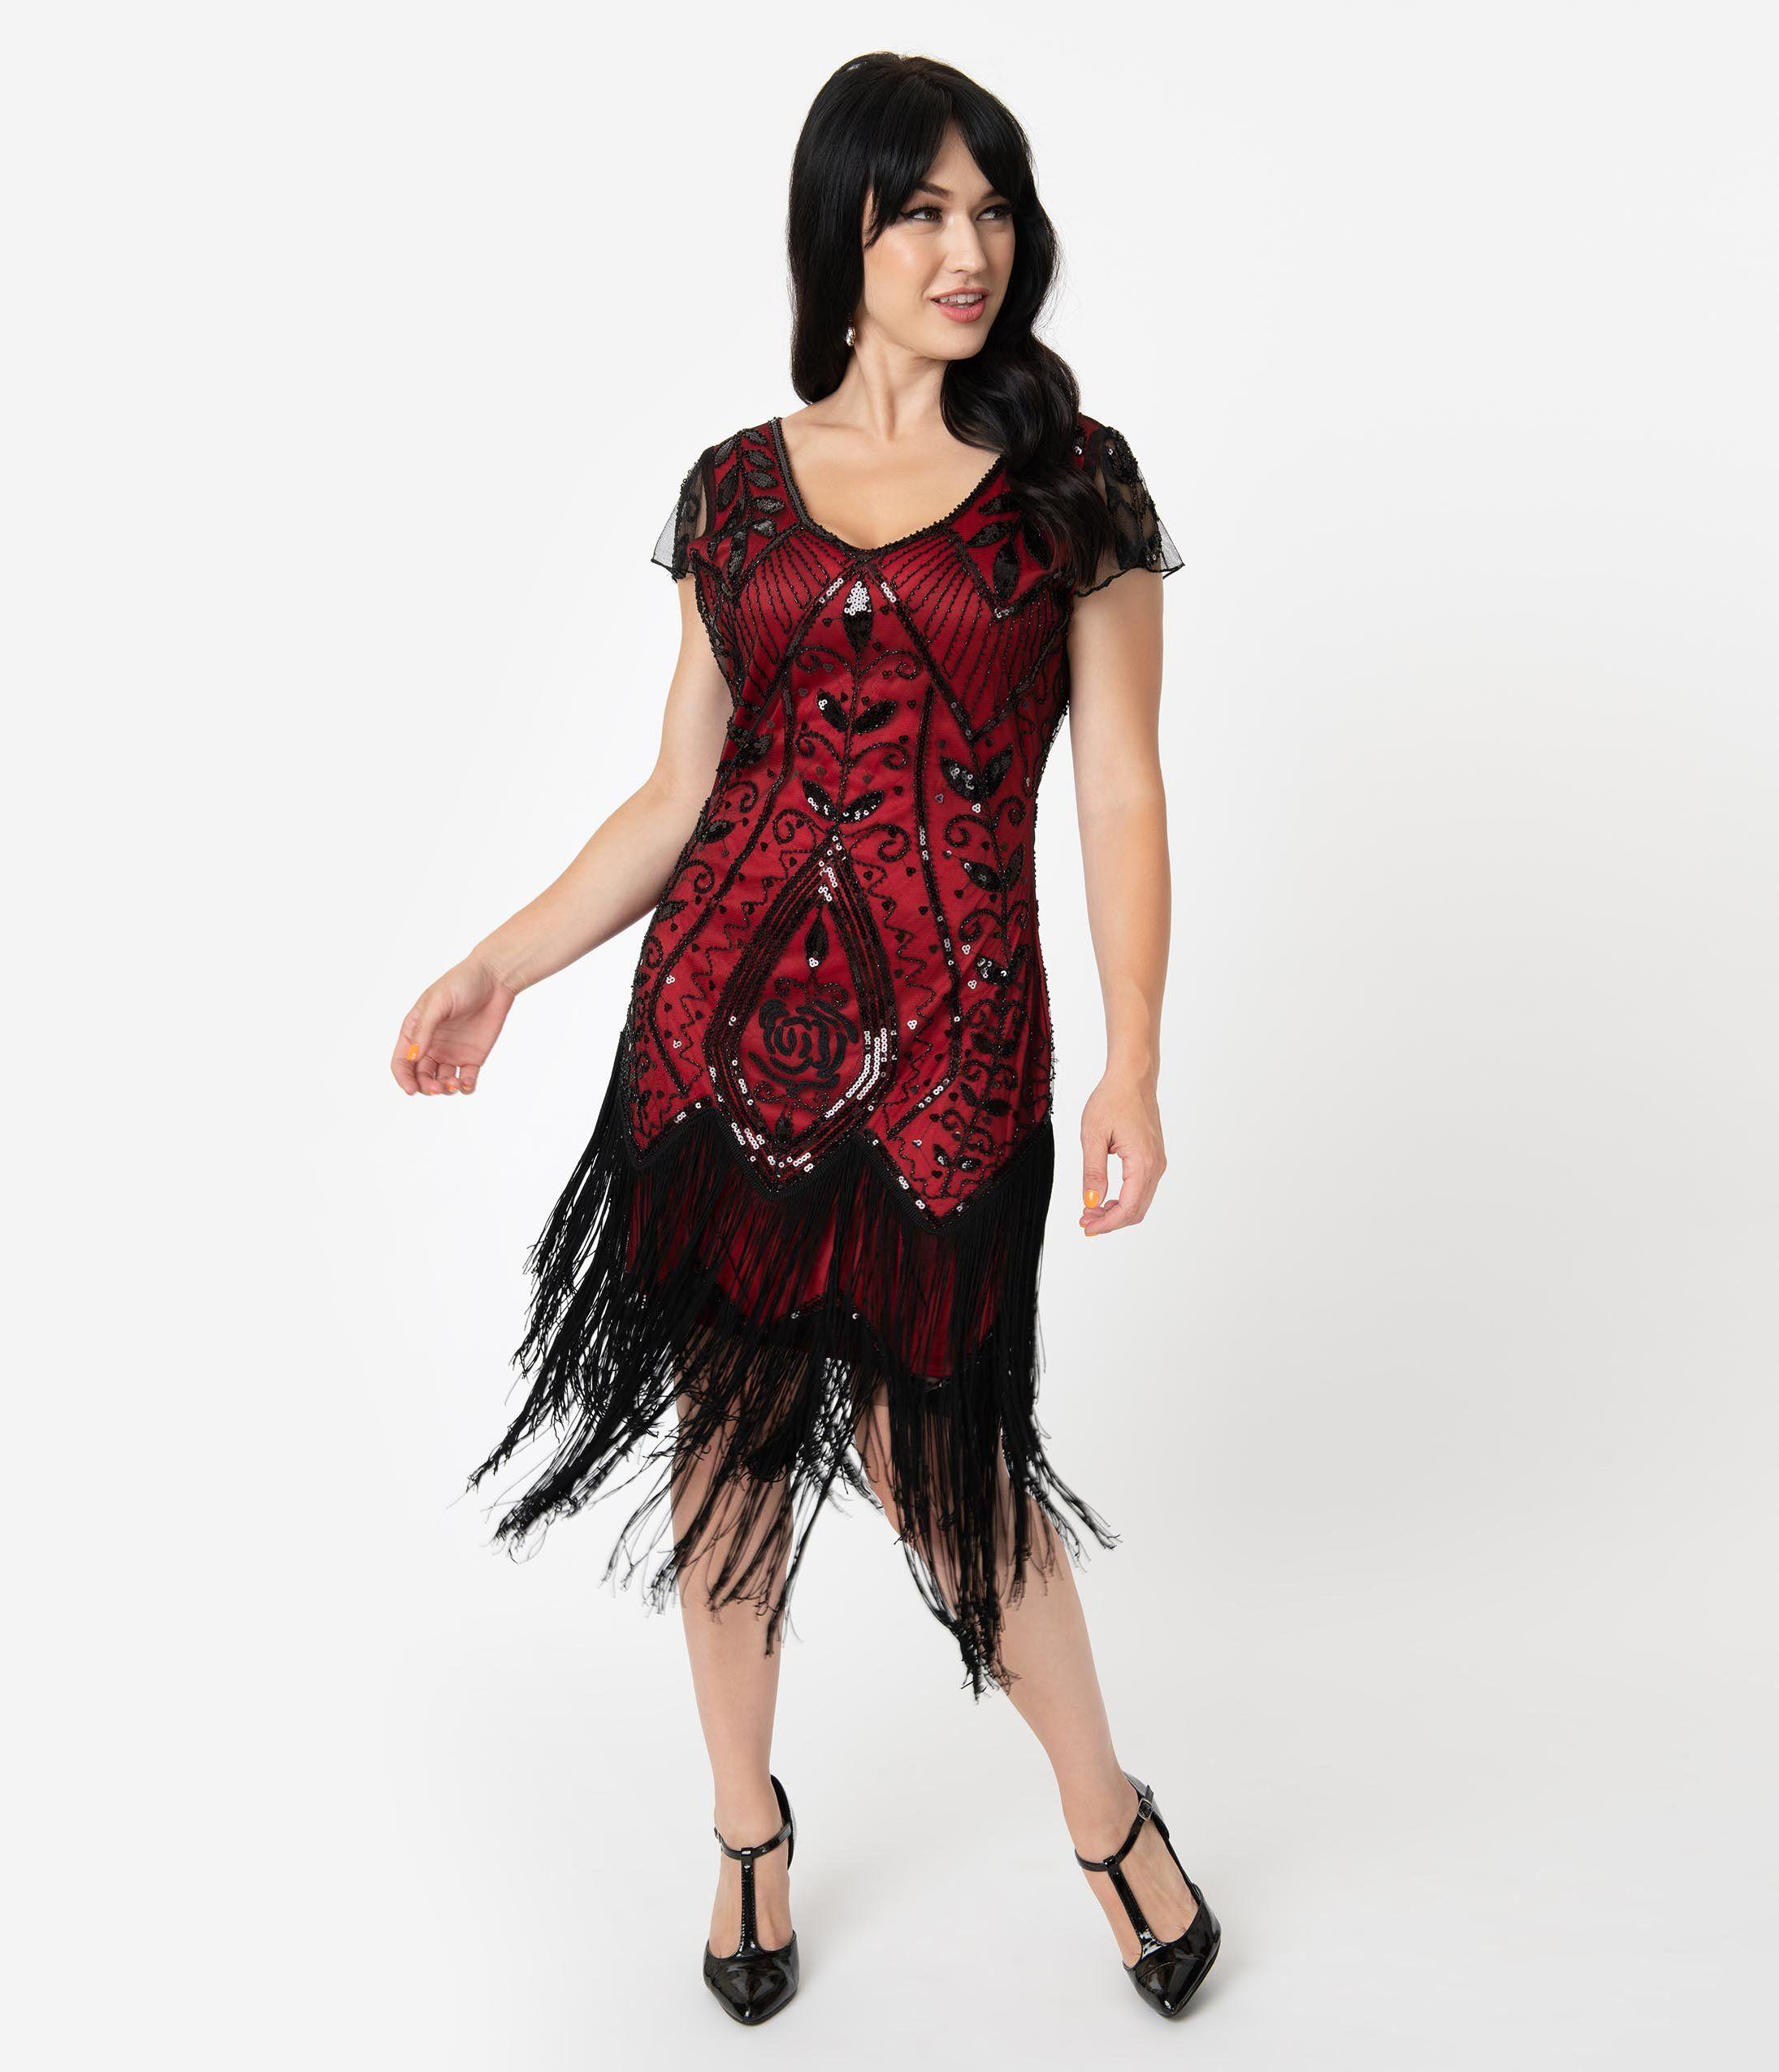 Unique Vintage 1920s Red Black Beaded Noele Flapper Dress Red Flapper Dress 1920s Flapper Dress Flapper Dress [ 2550 x 2190 Pixel ]